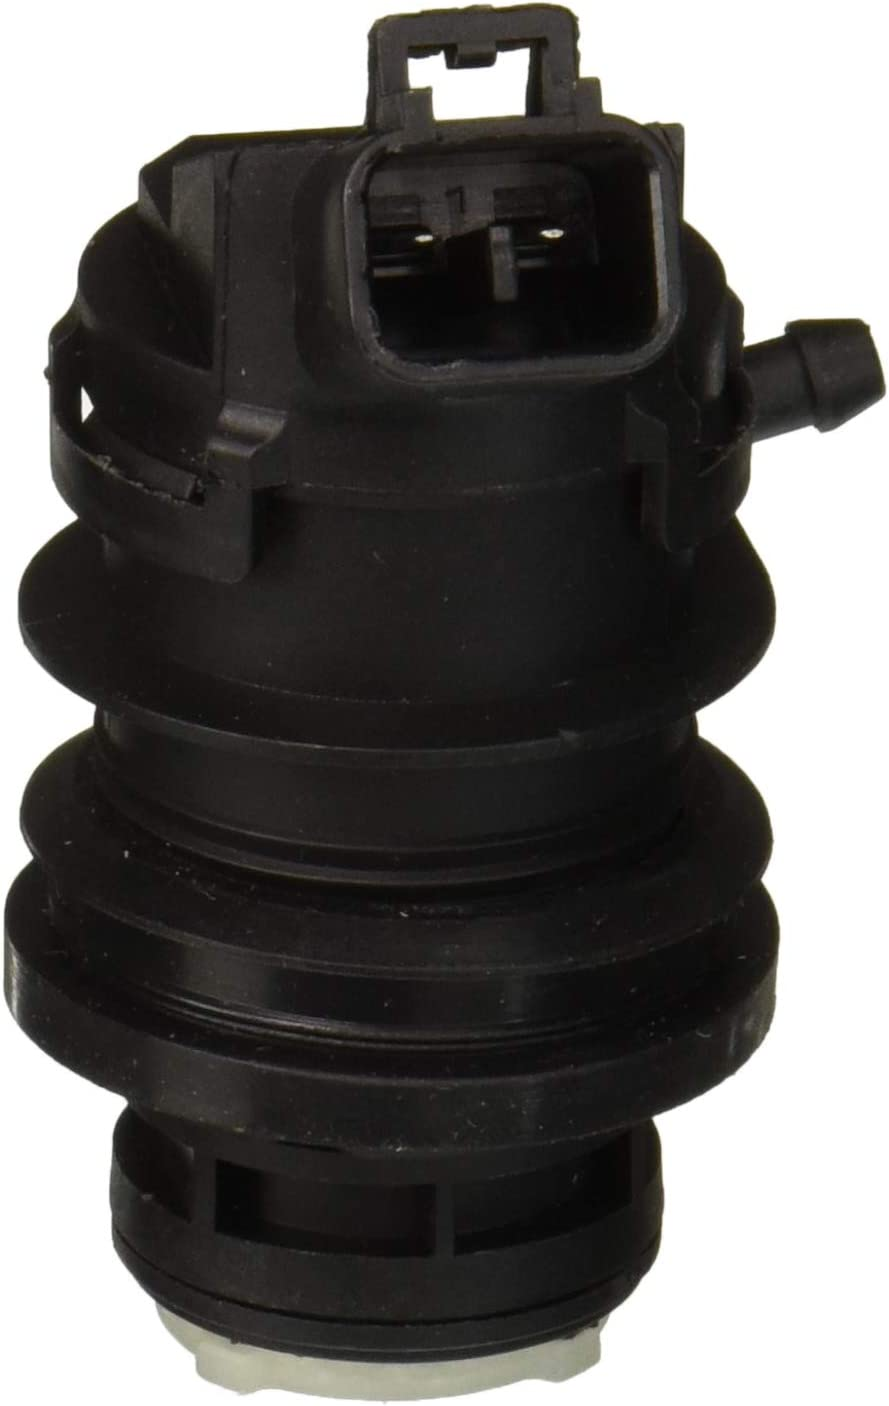 ANCO 67-08 Windshield Washer Pump